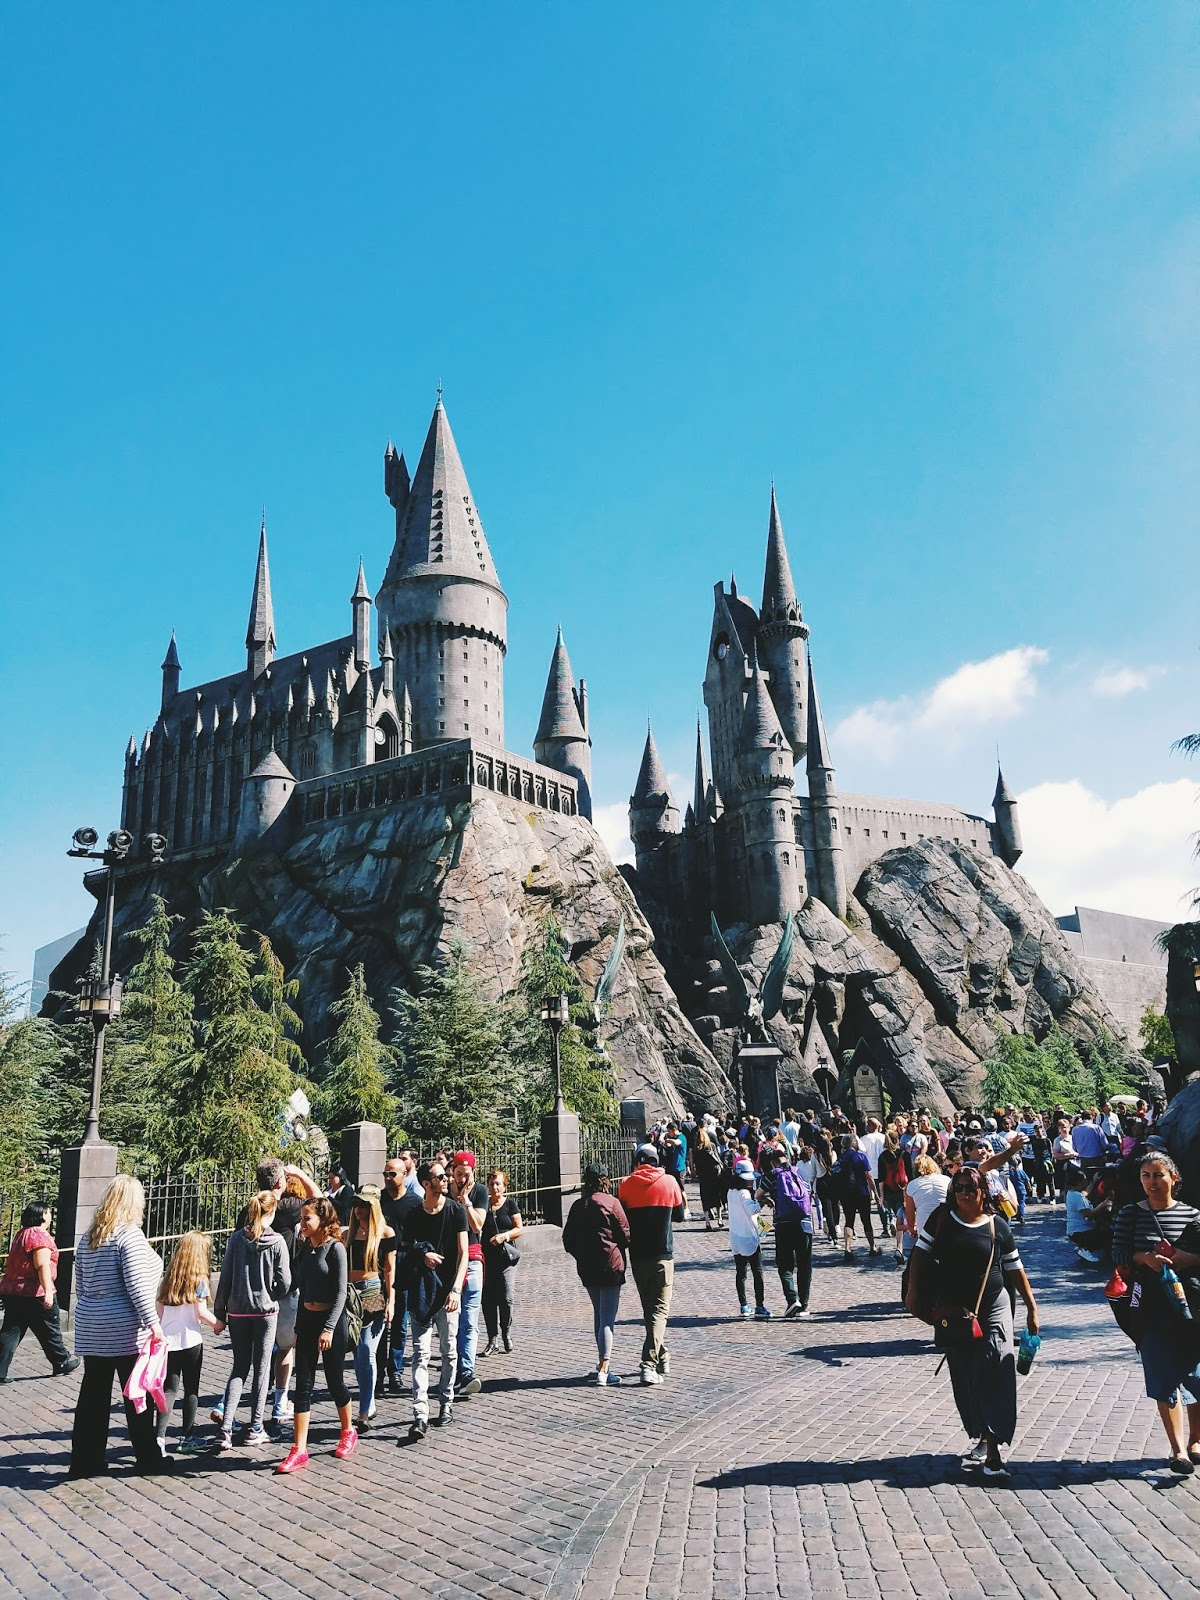 Courtney Tomesch Wizarding World of Harry Potter